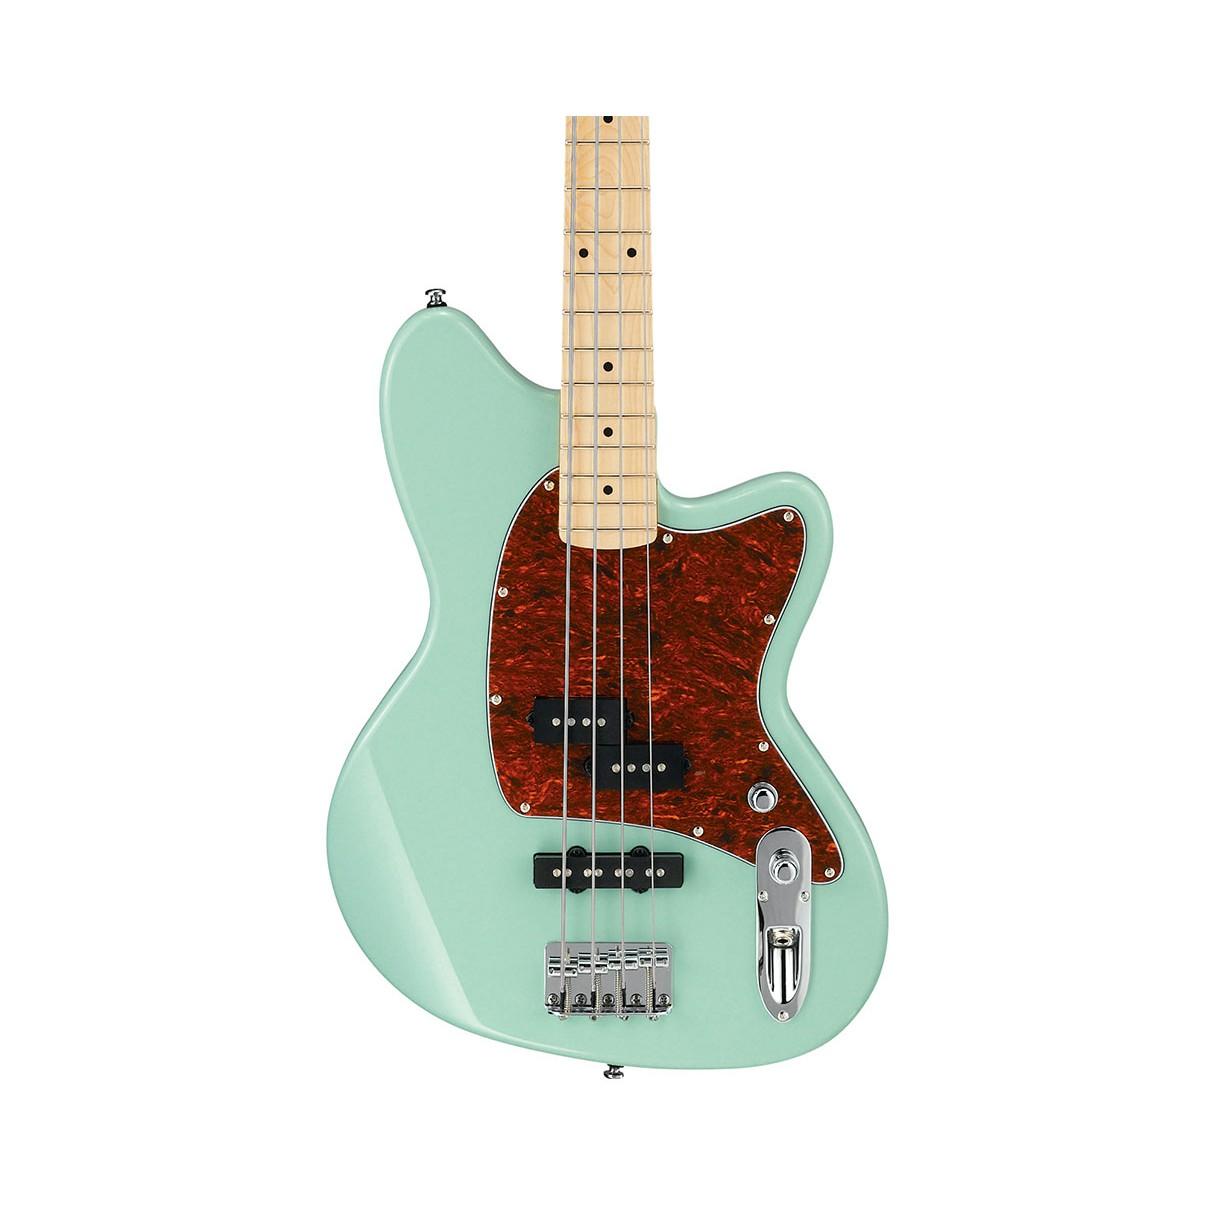 ibanez talman bass standard 4 string electric bass mint green. Black Bedroom Furniture Sets. Home Design Ideas